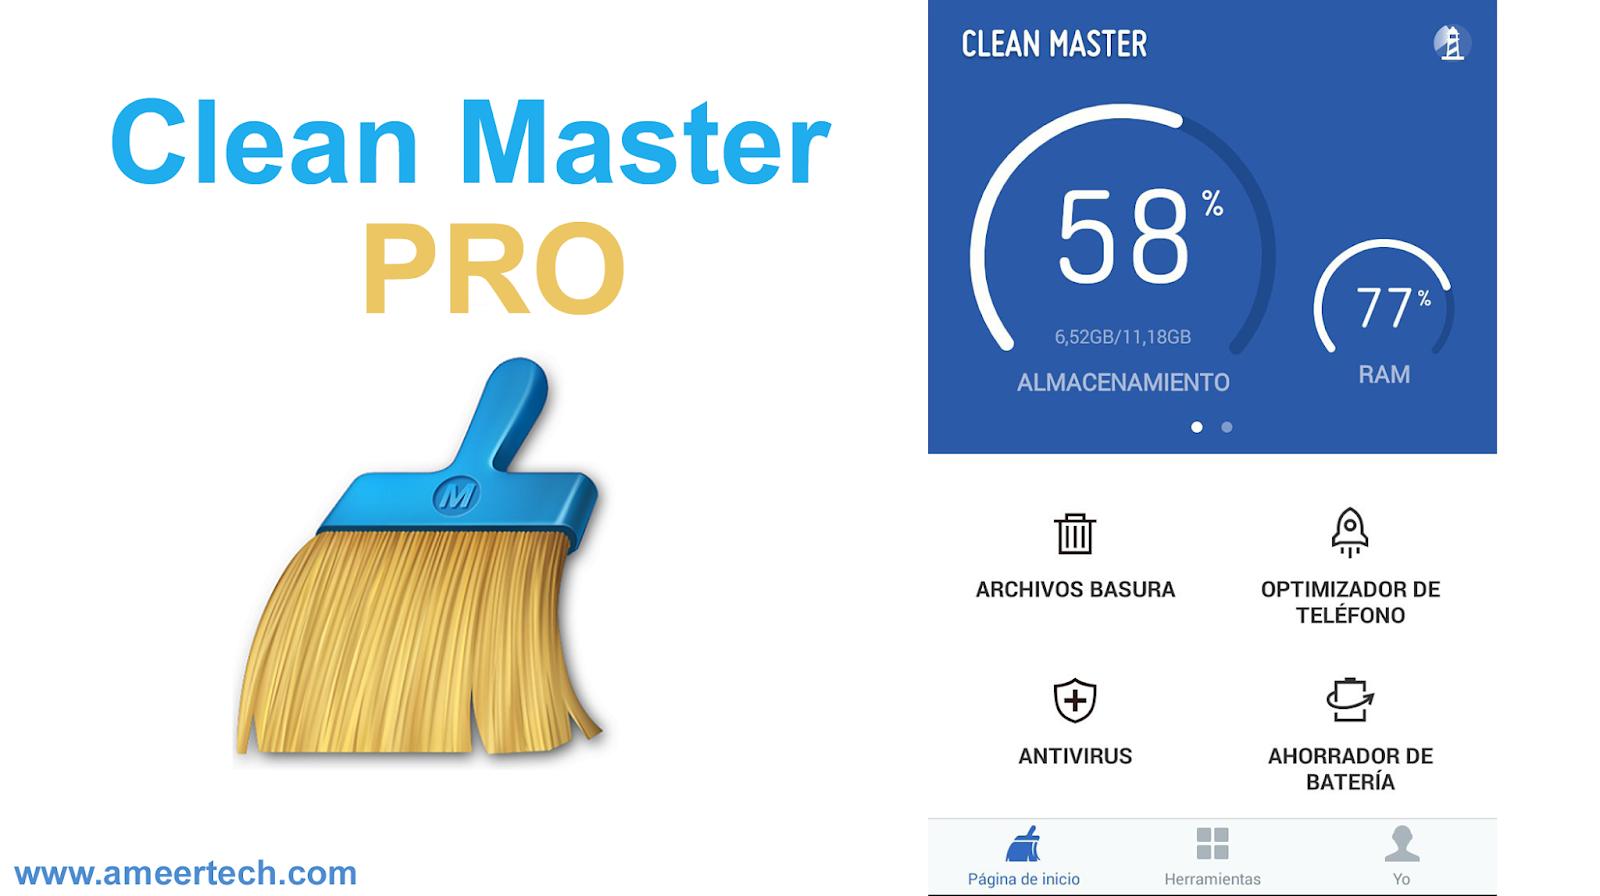 Download Clean Master PRO APK 2019